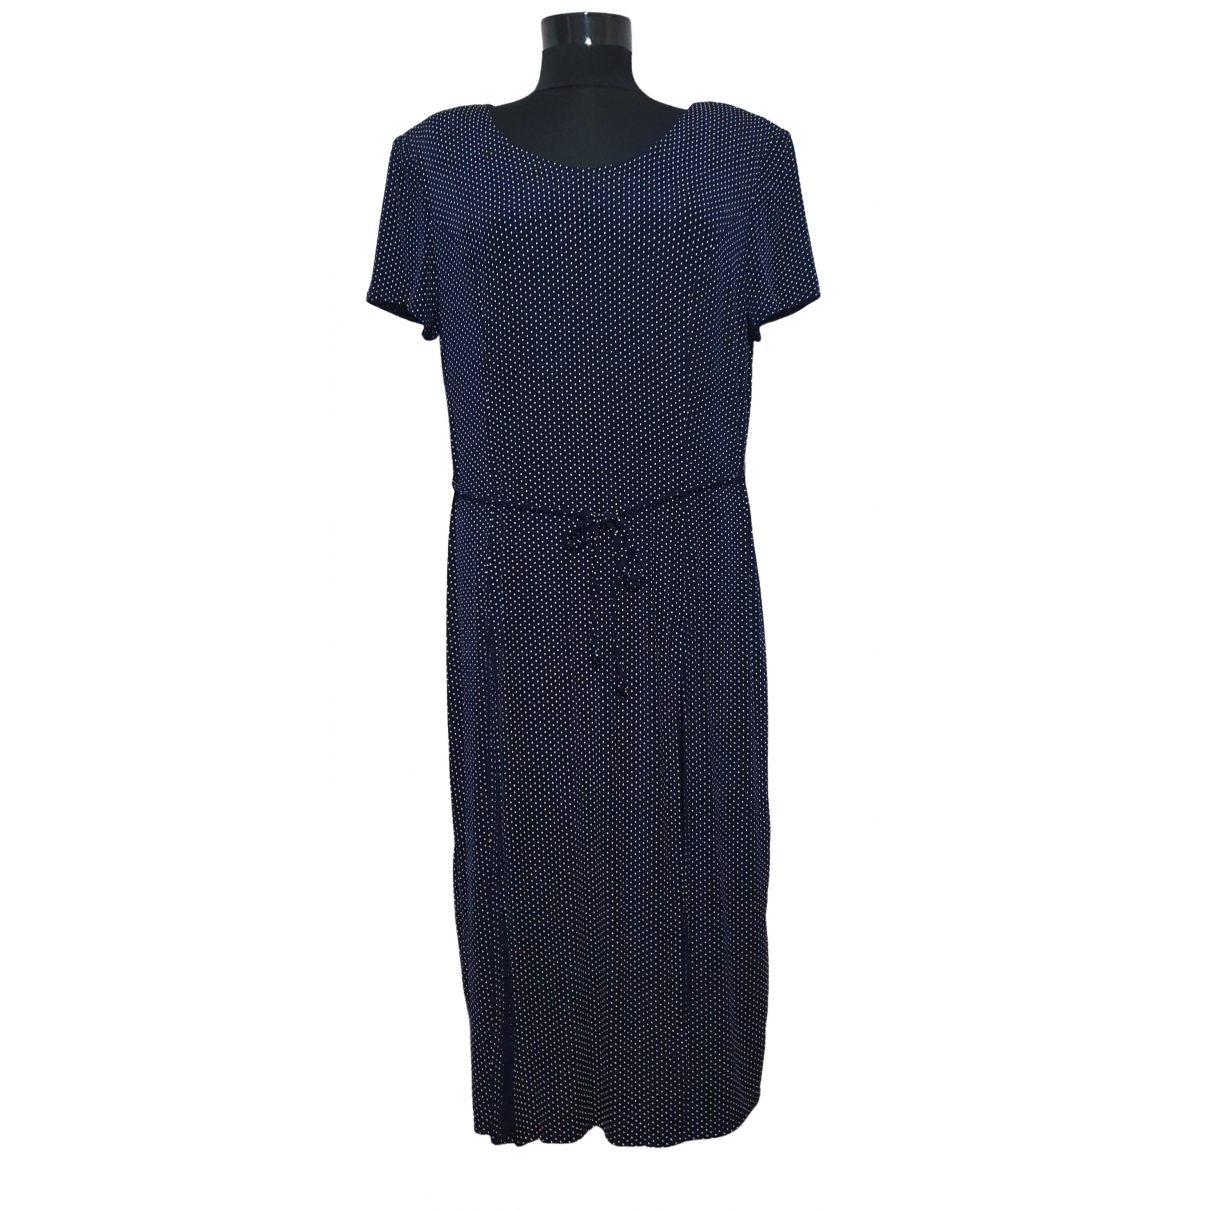 Joseph Ribkoff \N Blue dress for Women XL International